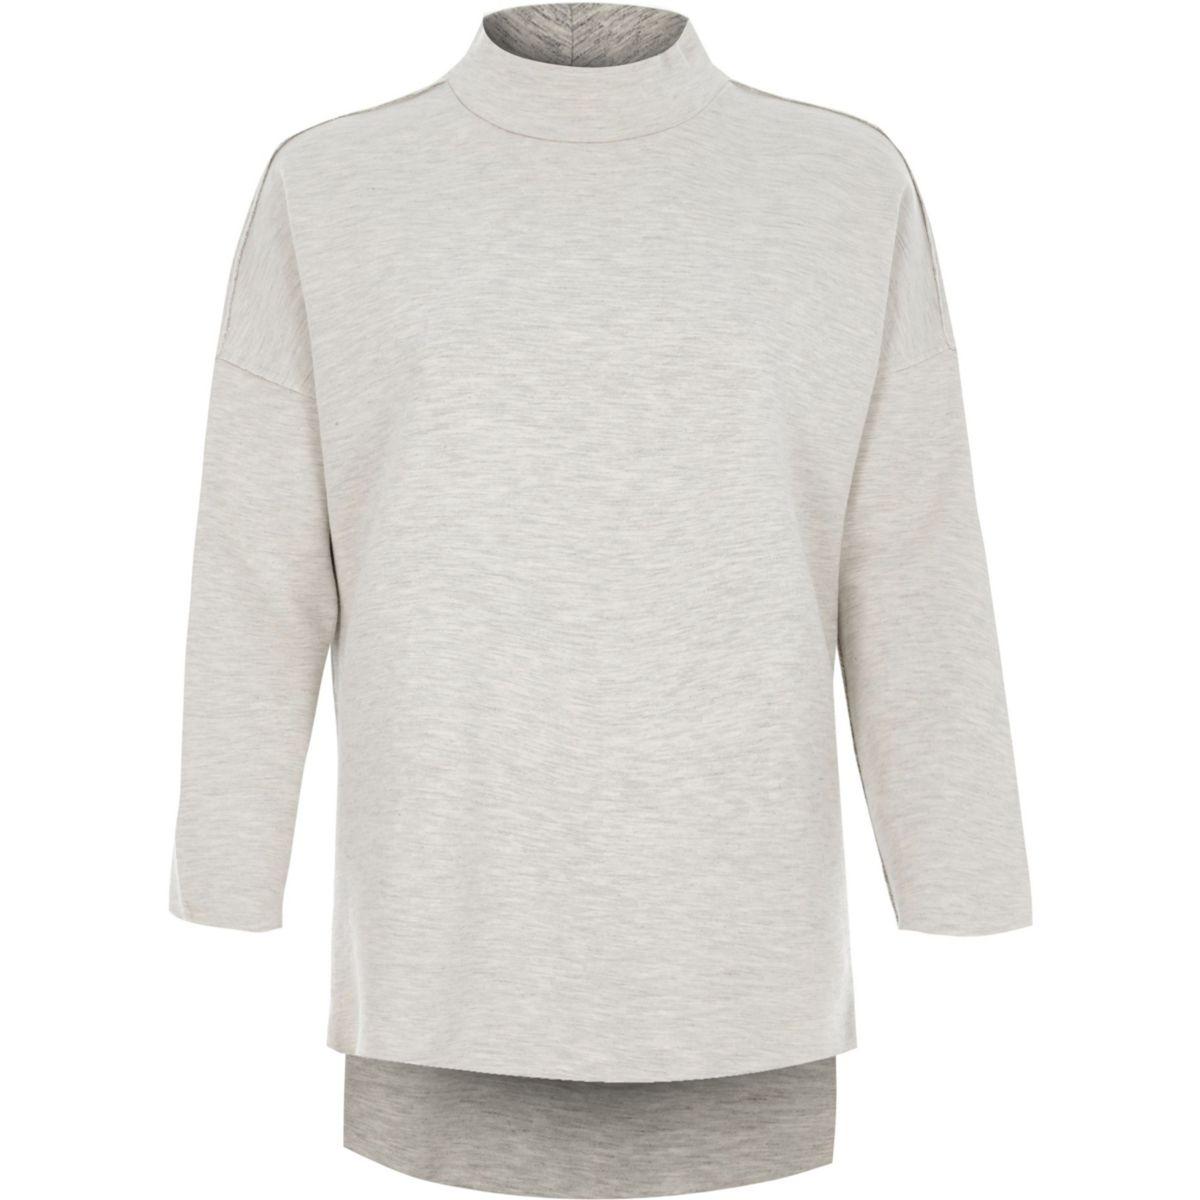 Light grey turtle neck sweatshirt